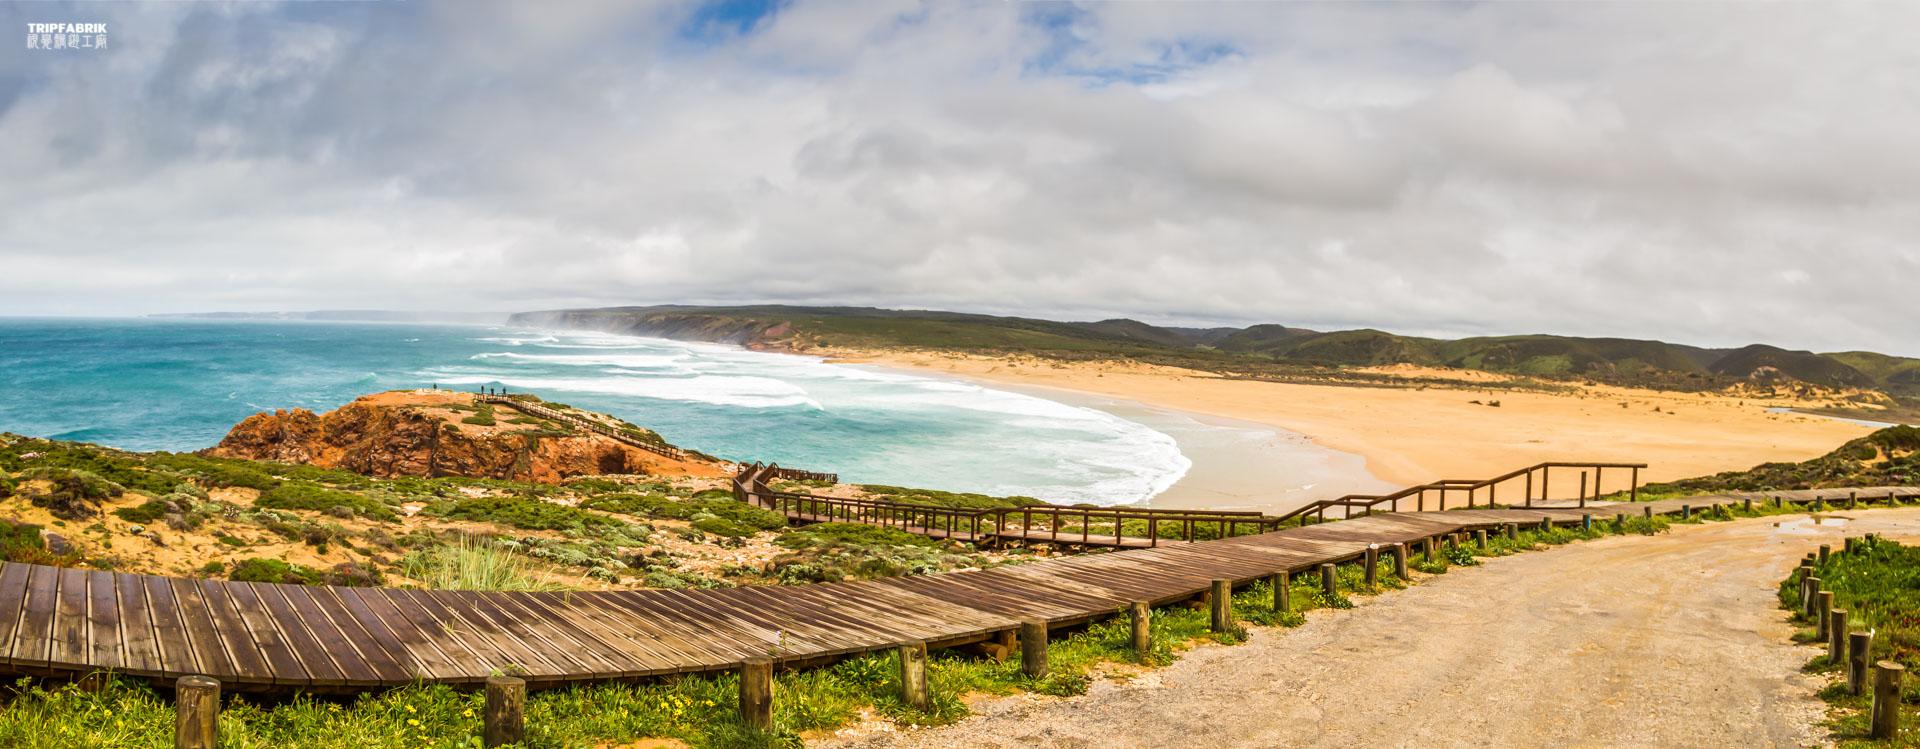 portugal algarve timelapse travel video